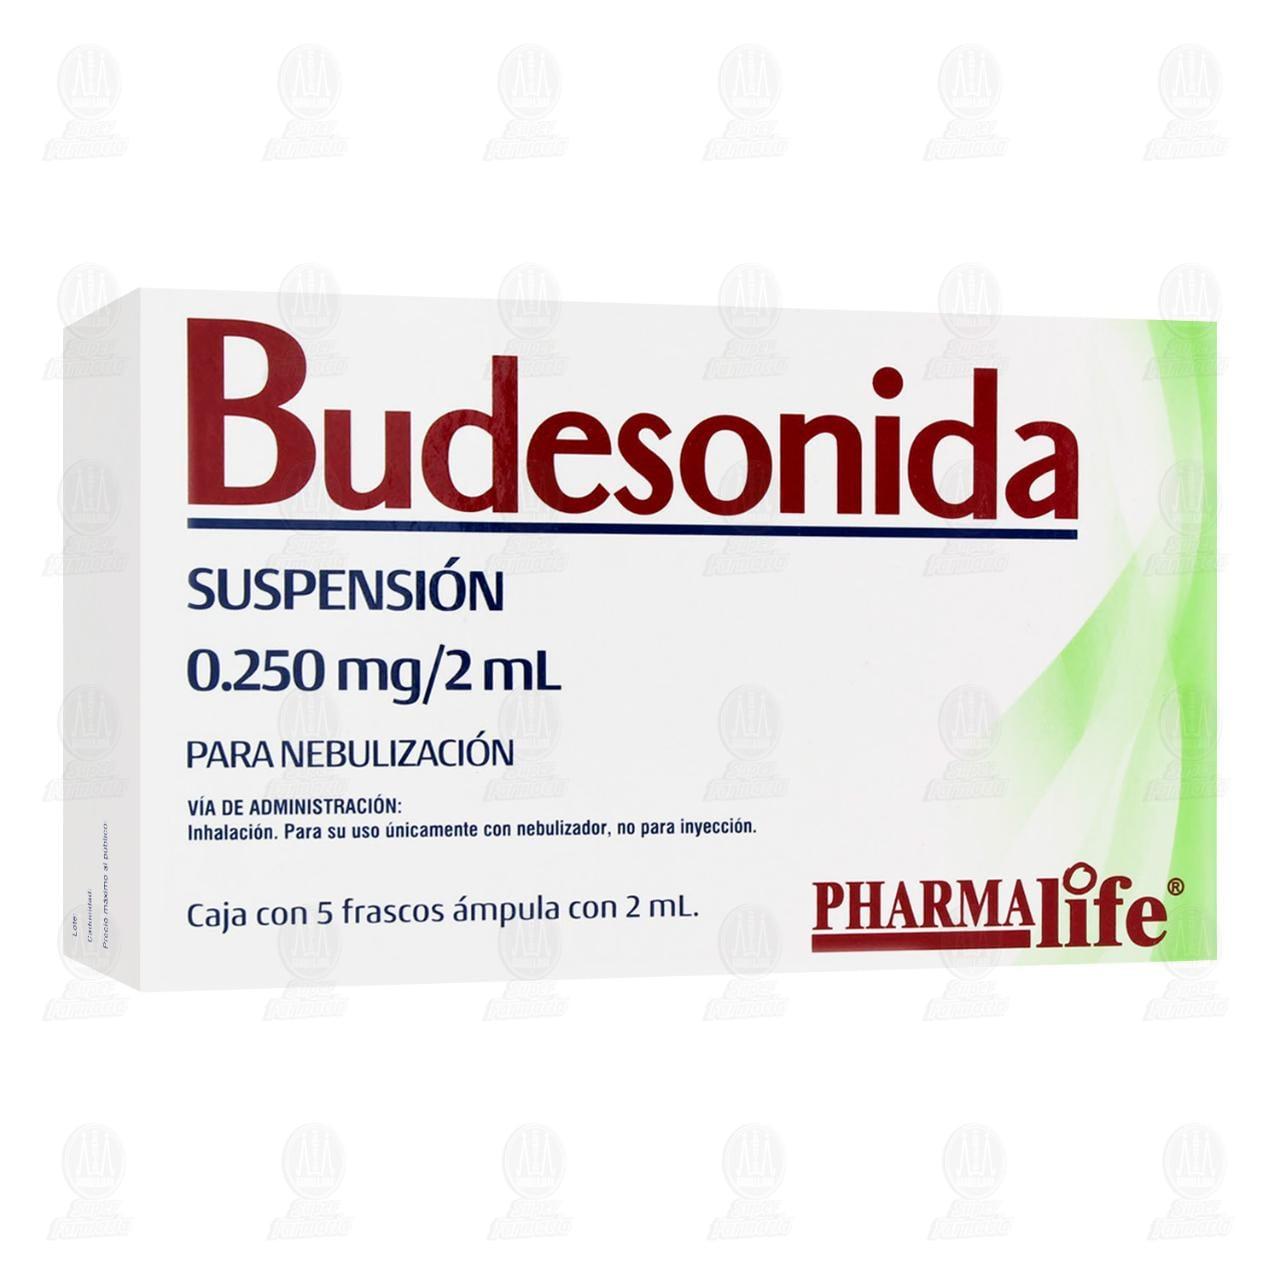 Comprar Budesonida 0.250mg/ml 2ml Nebulizaciones 5 Frascos Ámpula Pharmalife en Farmacias Guadalajara